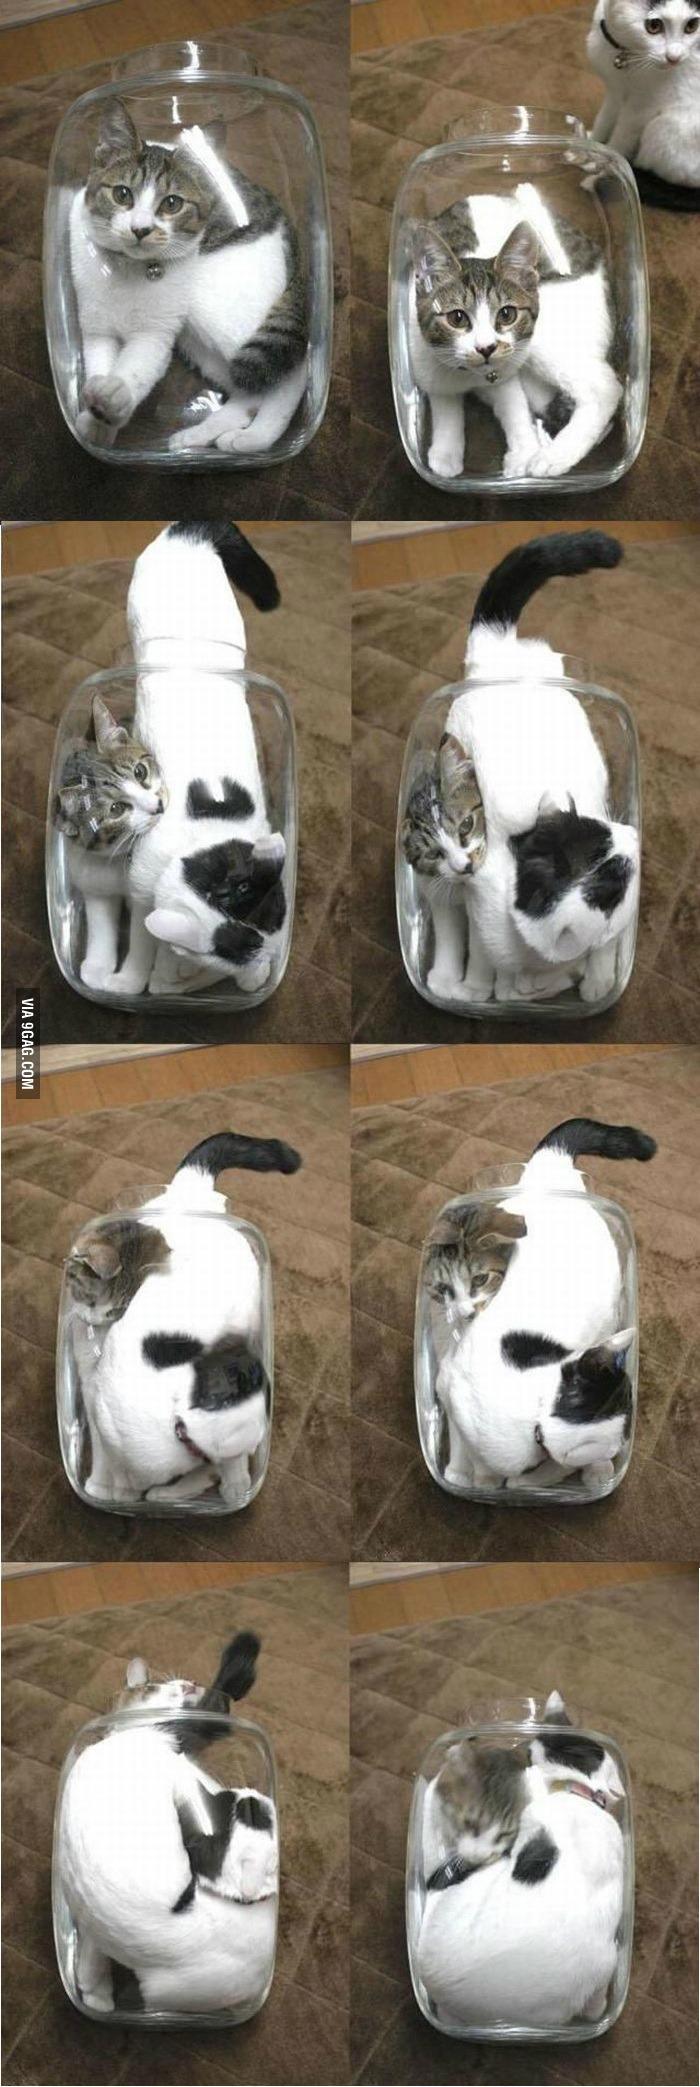 2 kittens in a glass jar Bonsai kitten, Kittens, Glass jars